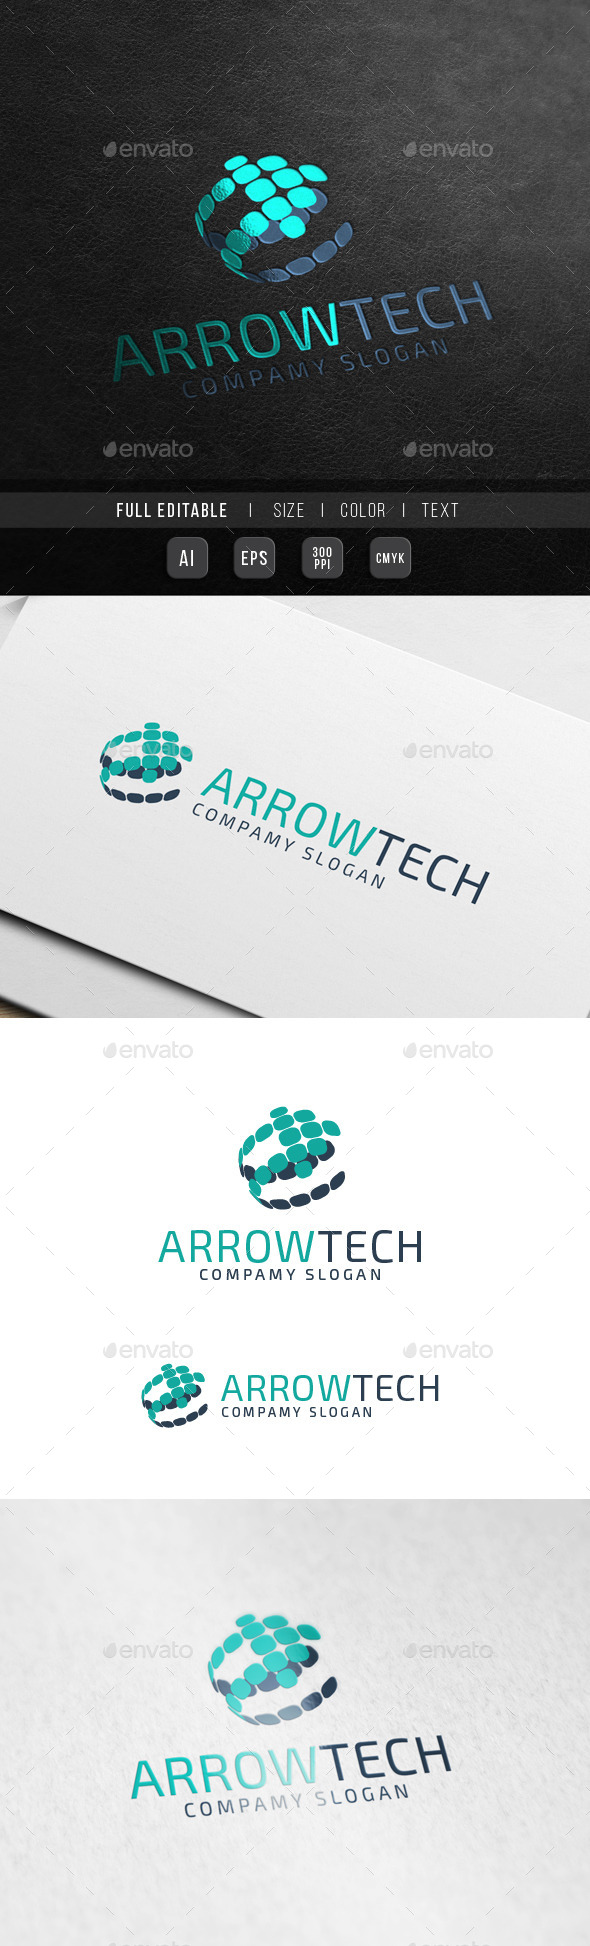 Global Arrow Technology - Music World chart - Abstract Logo Templates